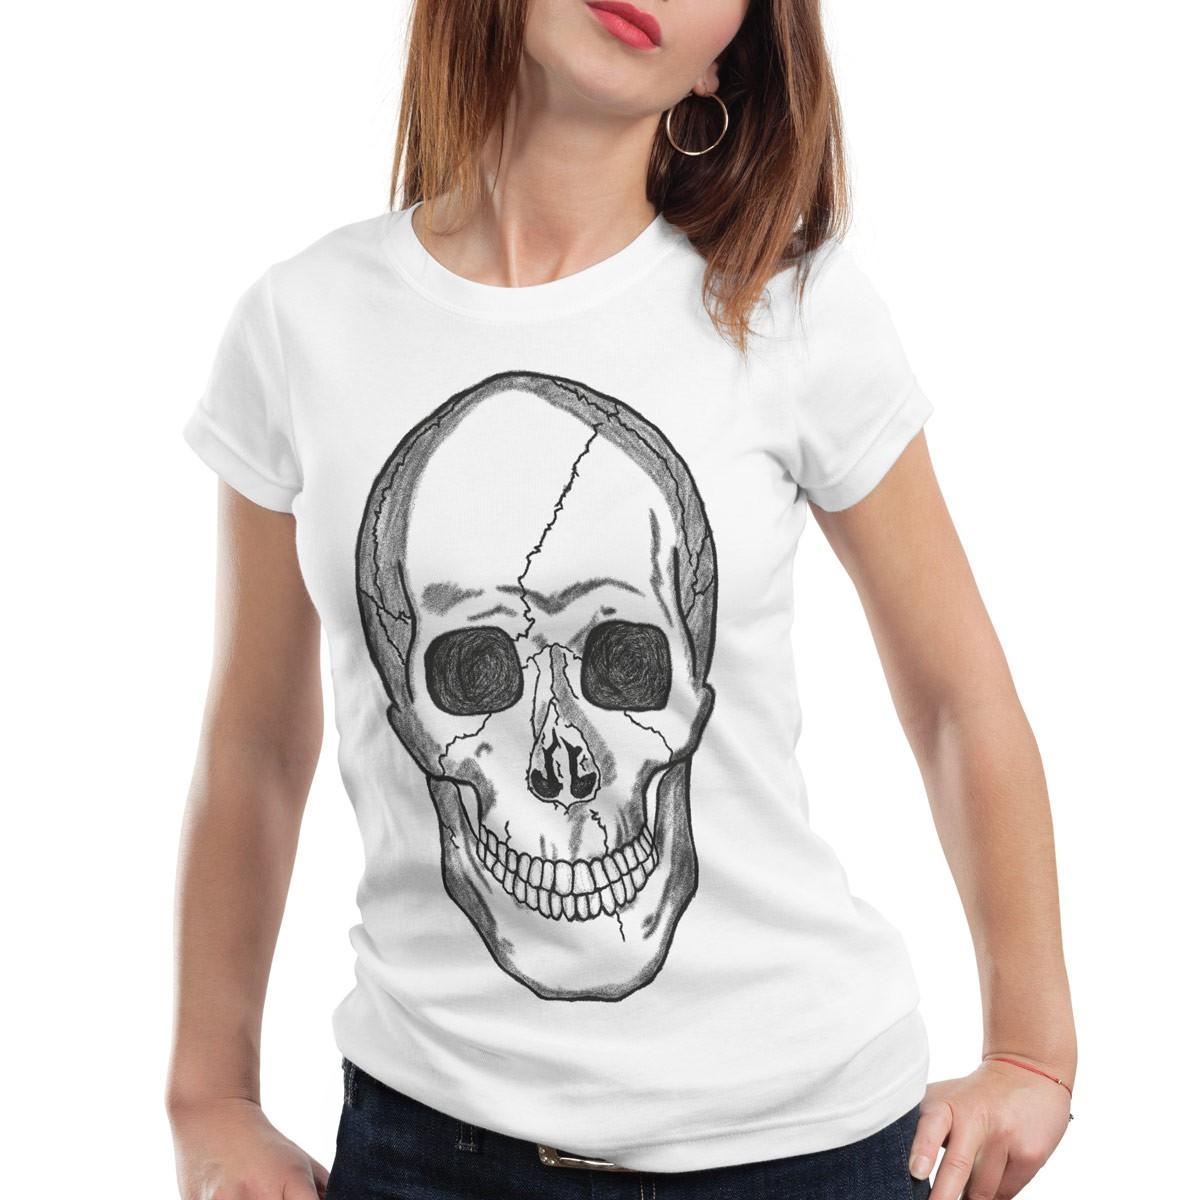 smiling skull damen t shirt totenkopf rocker punk style trend xs s m l xl xxl ebay. Black Bedroom Furniture Sets. Home Design Ideas